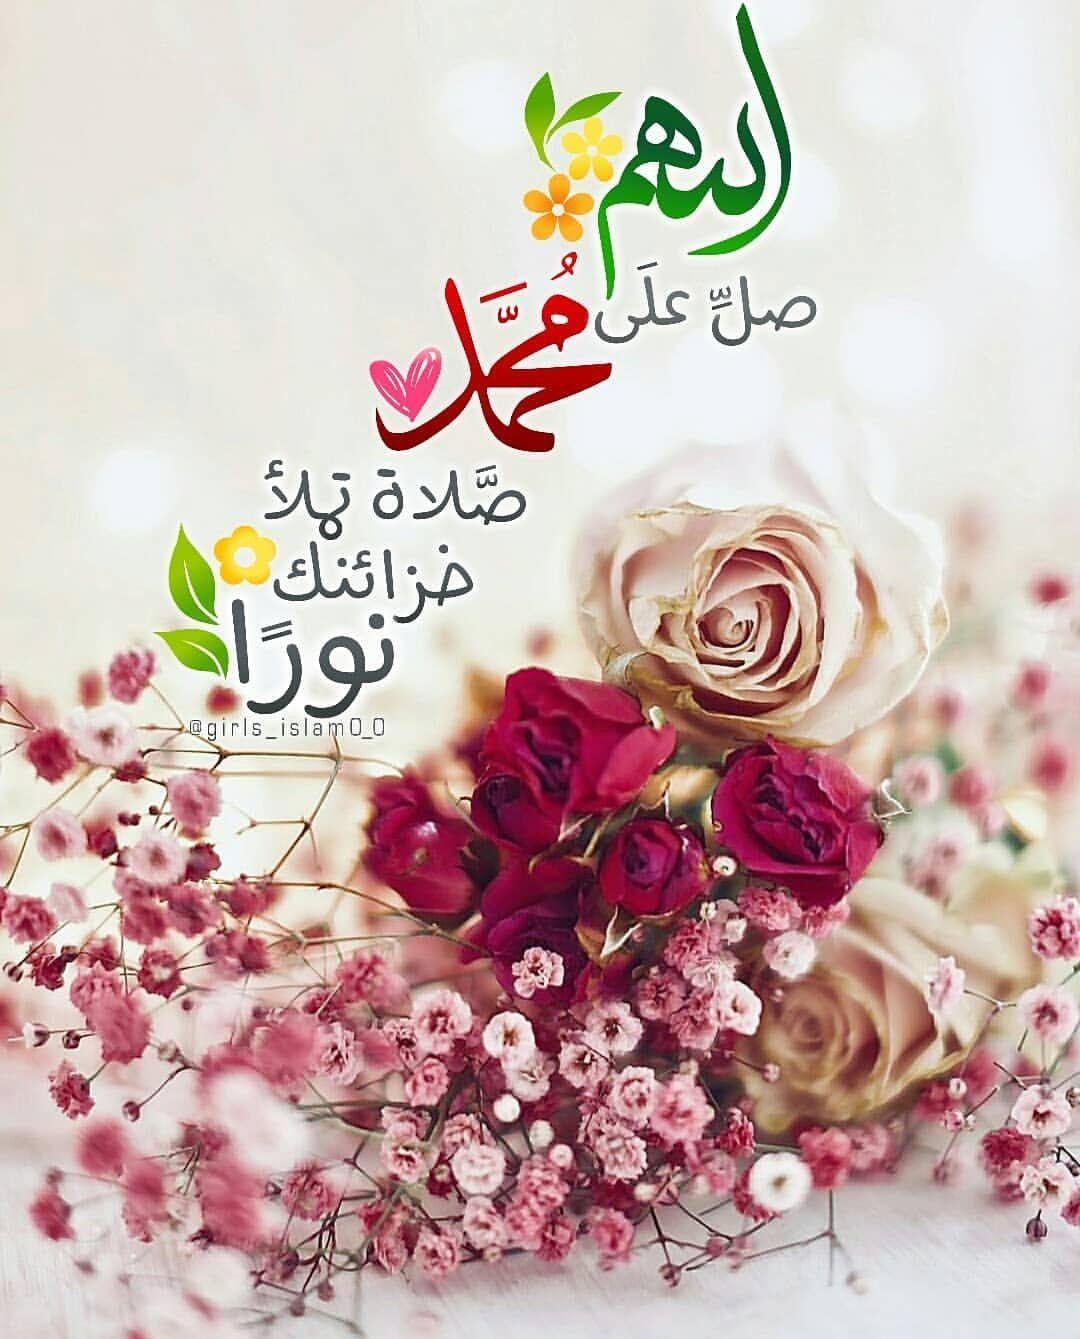 صور دعاء يوم الجمعة 2020 Islamic Quotes Wallpaper Islamic Images Islamic Pictures